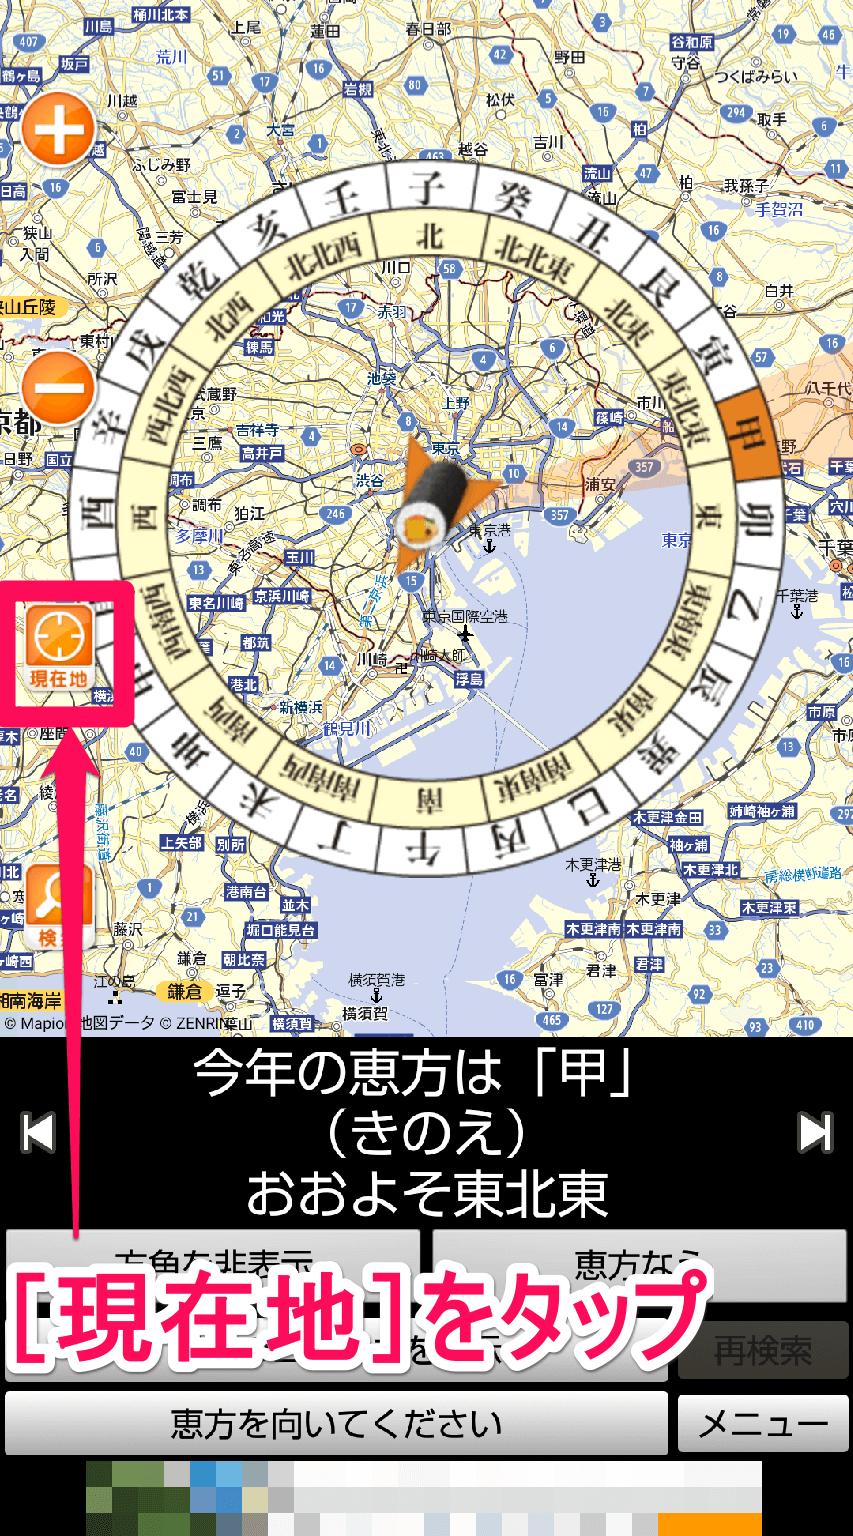 Android(アンドロイド)版&iPhone(アイフォーン)版「恵方マピオン」の画面